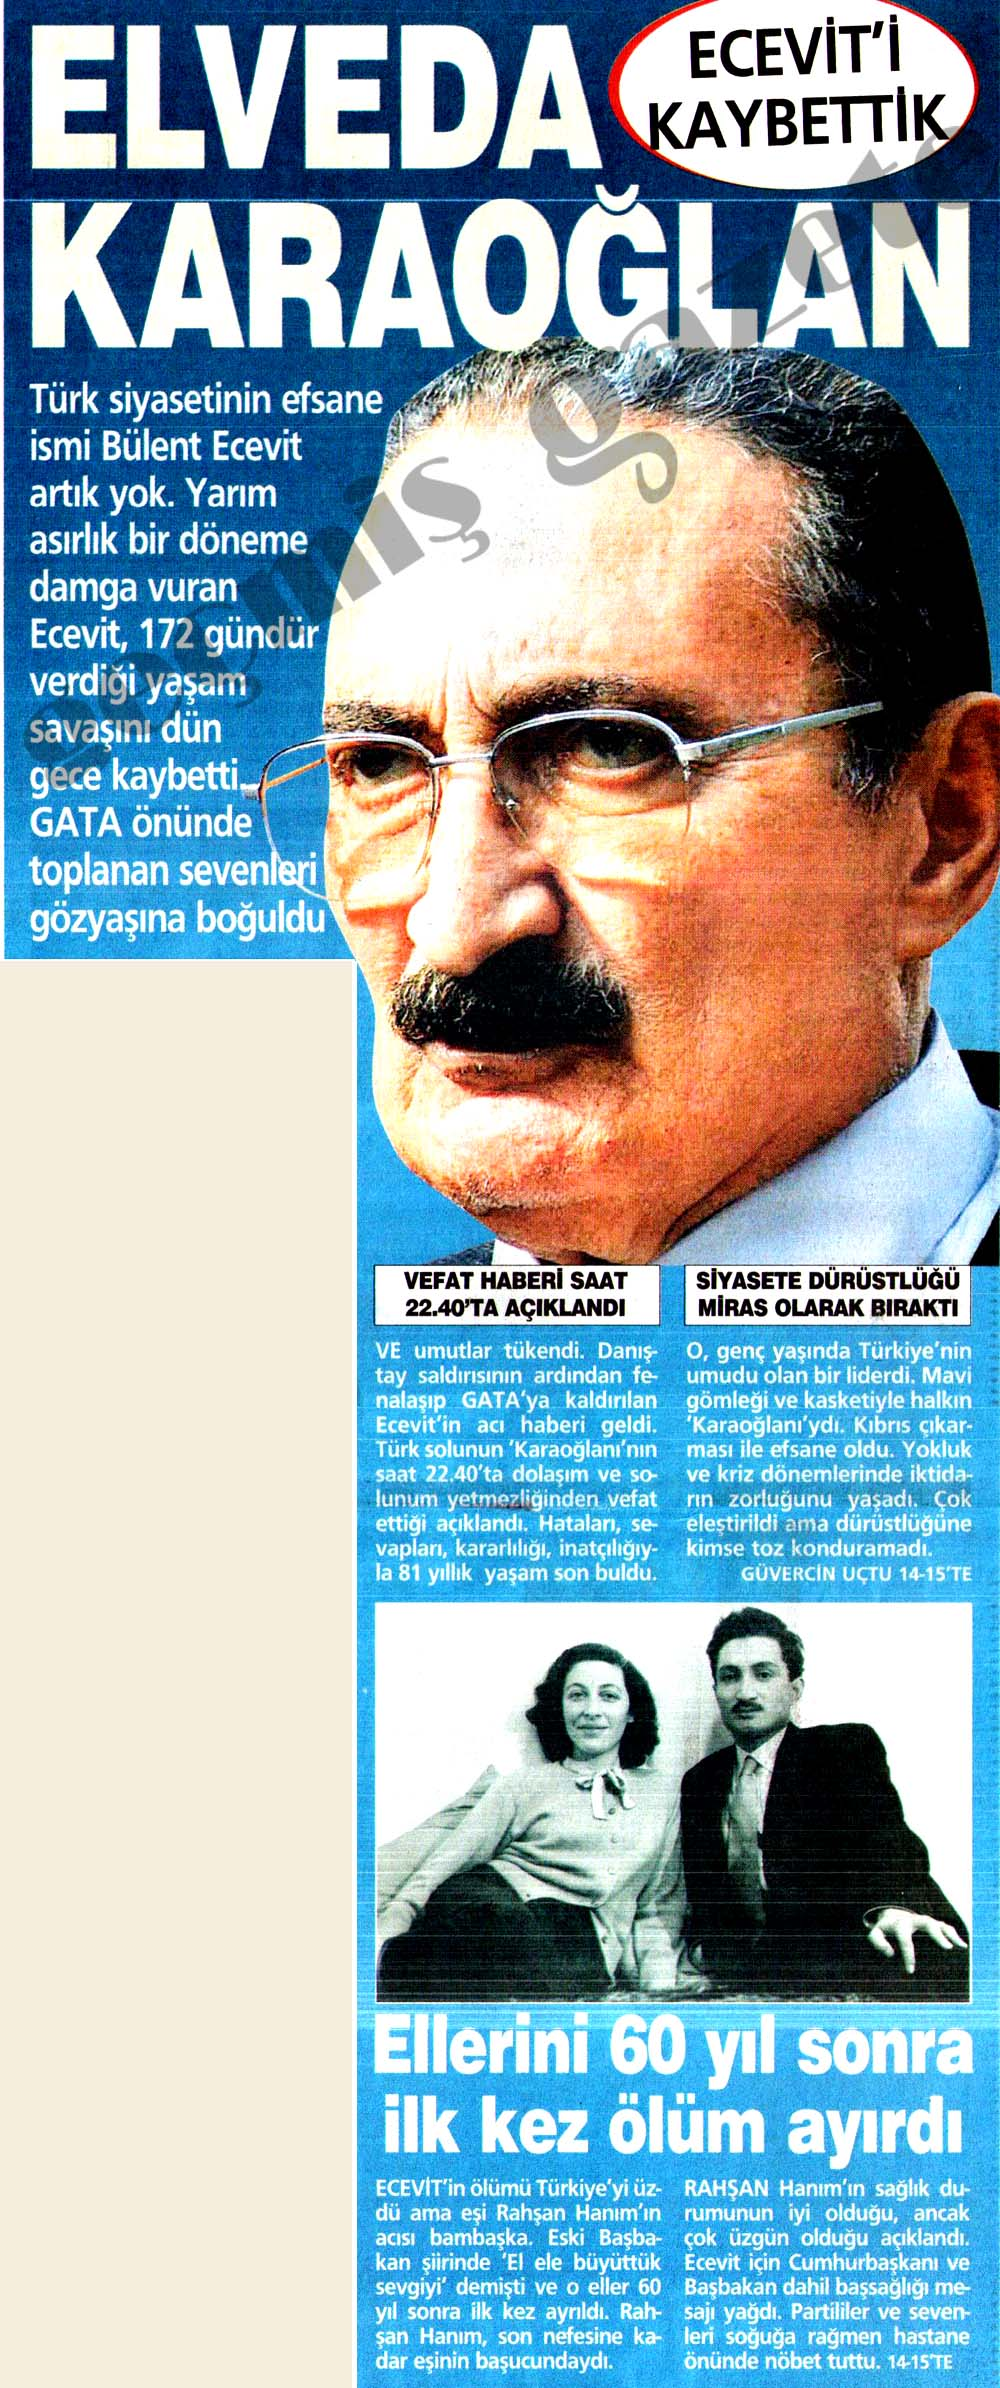 Elveda Karaoğlan